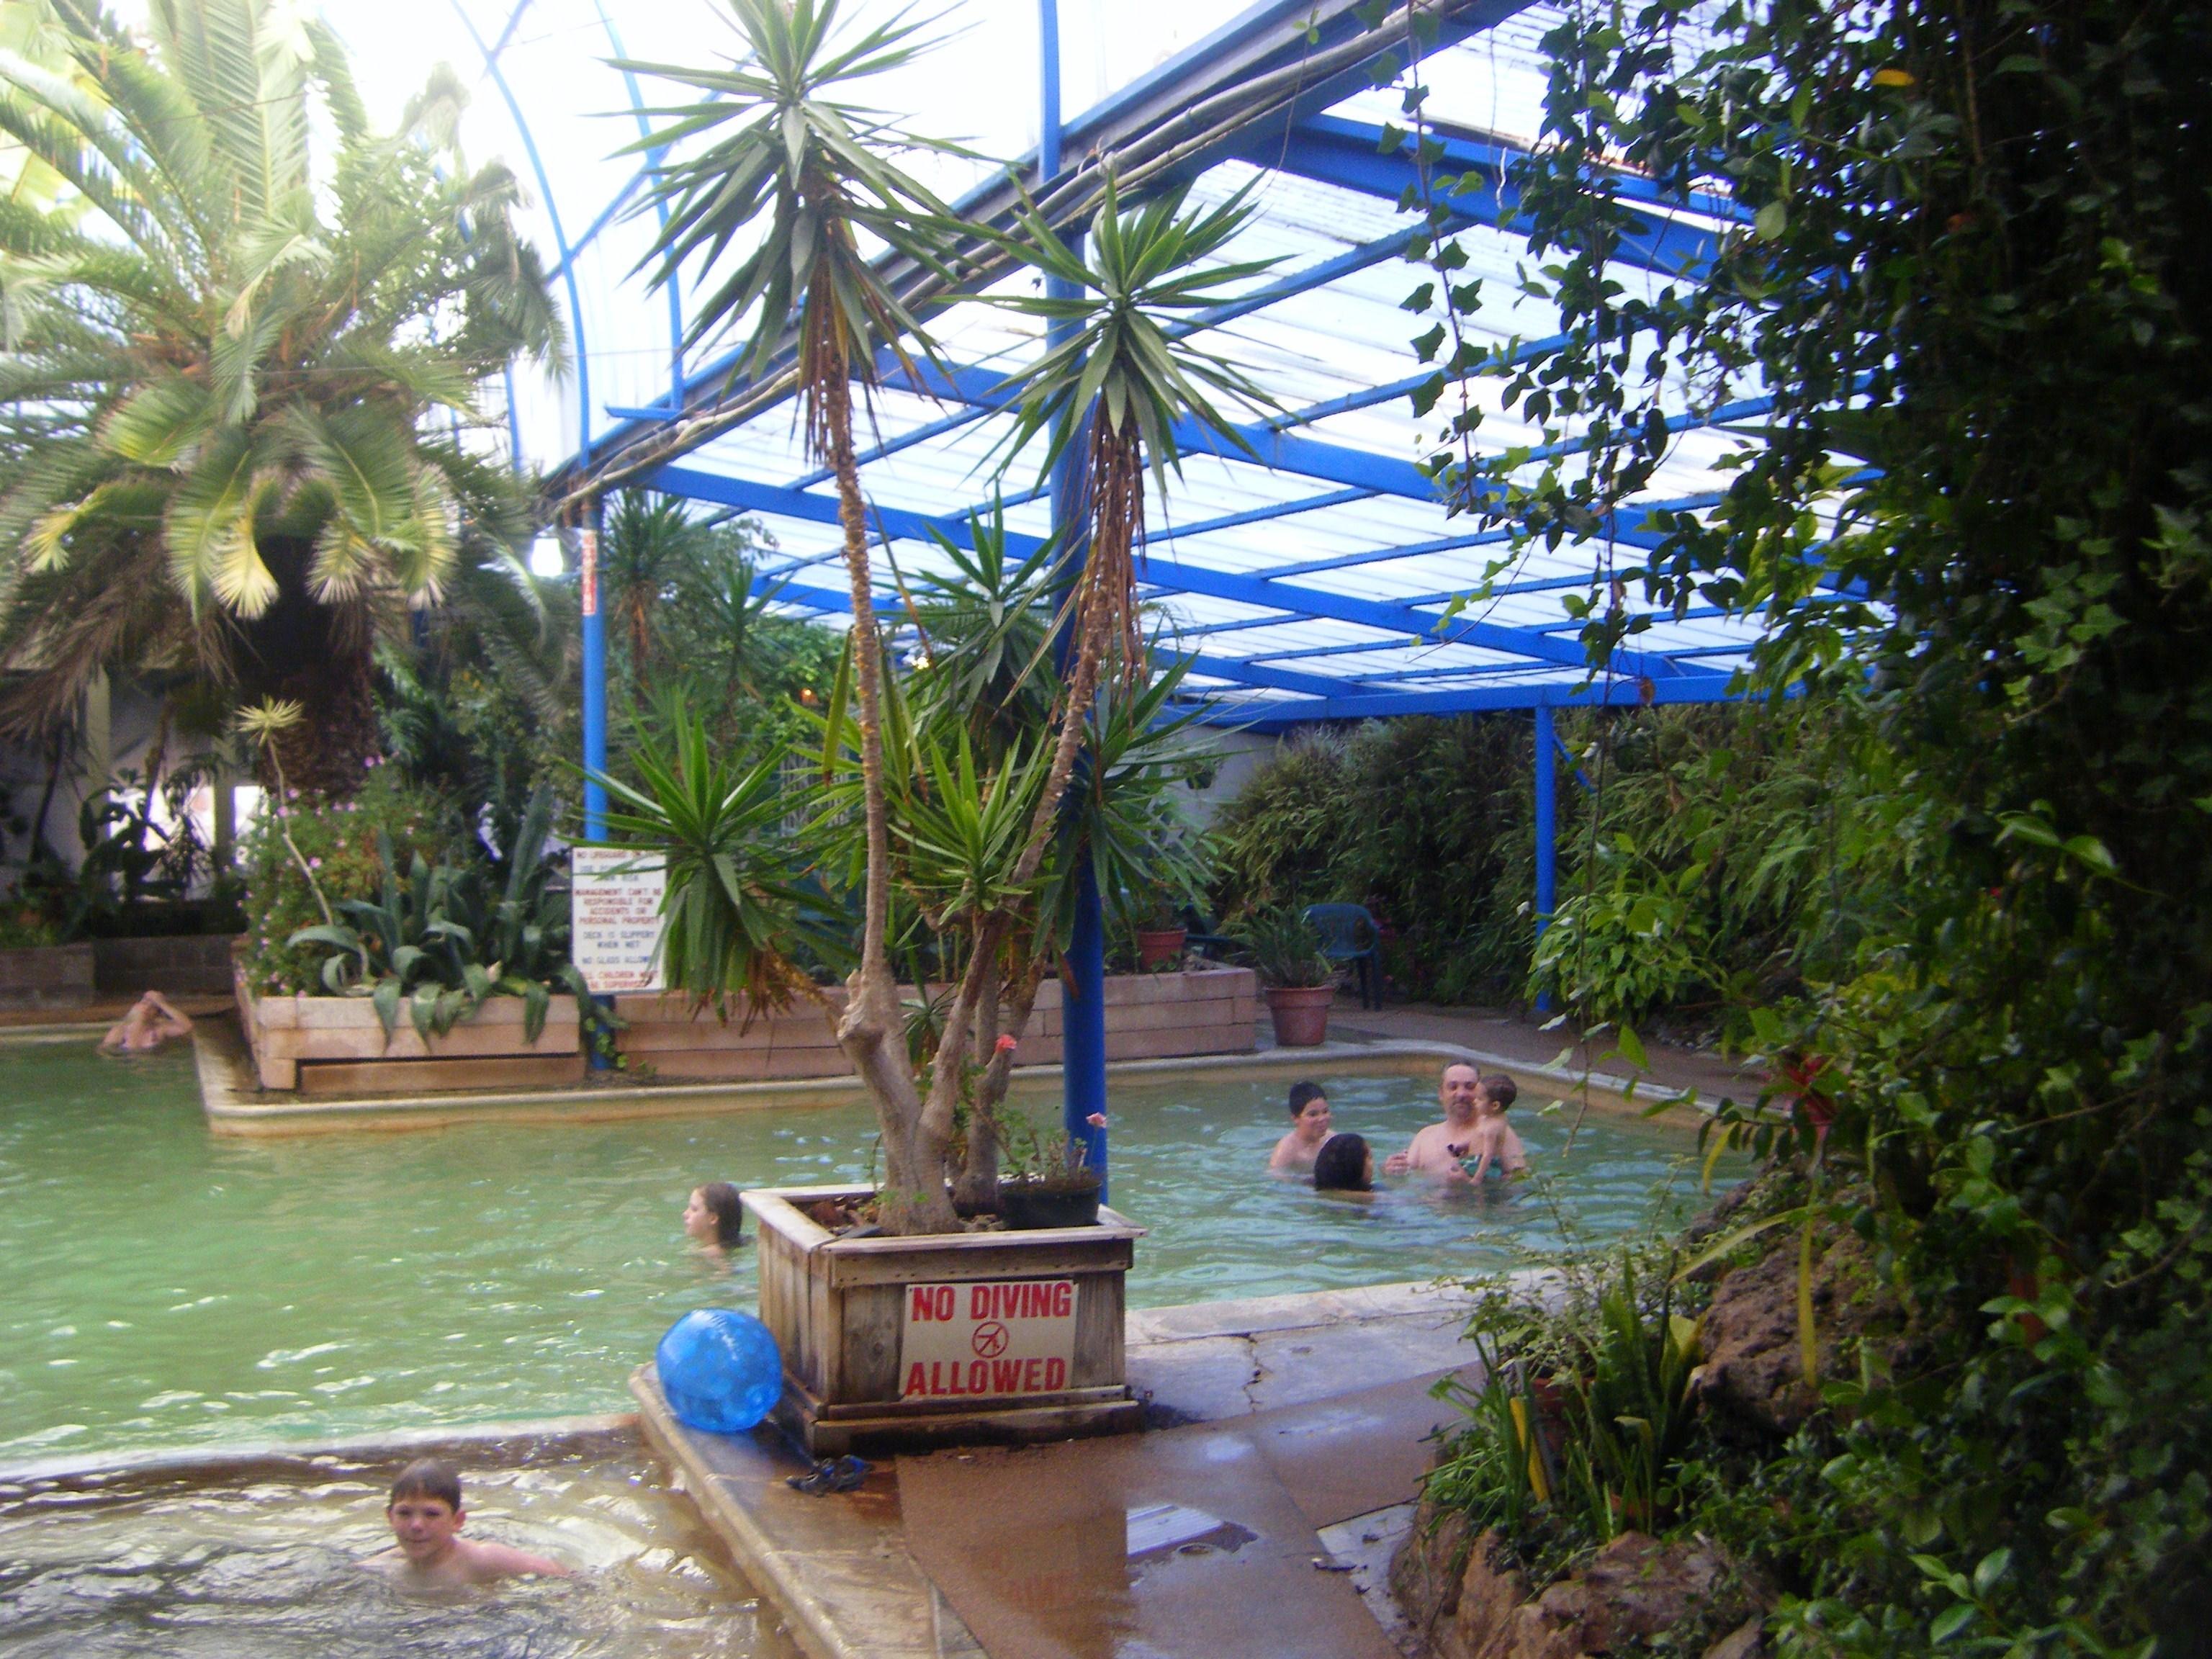 Indian Hot Springs Colorado Hot Springs Travel Guide